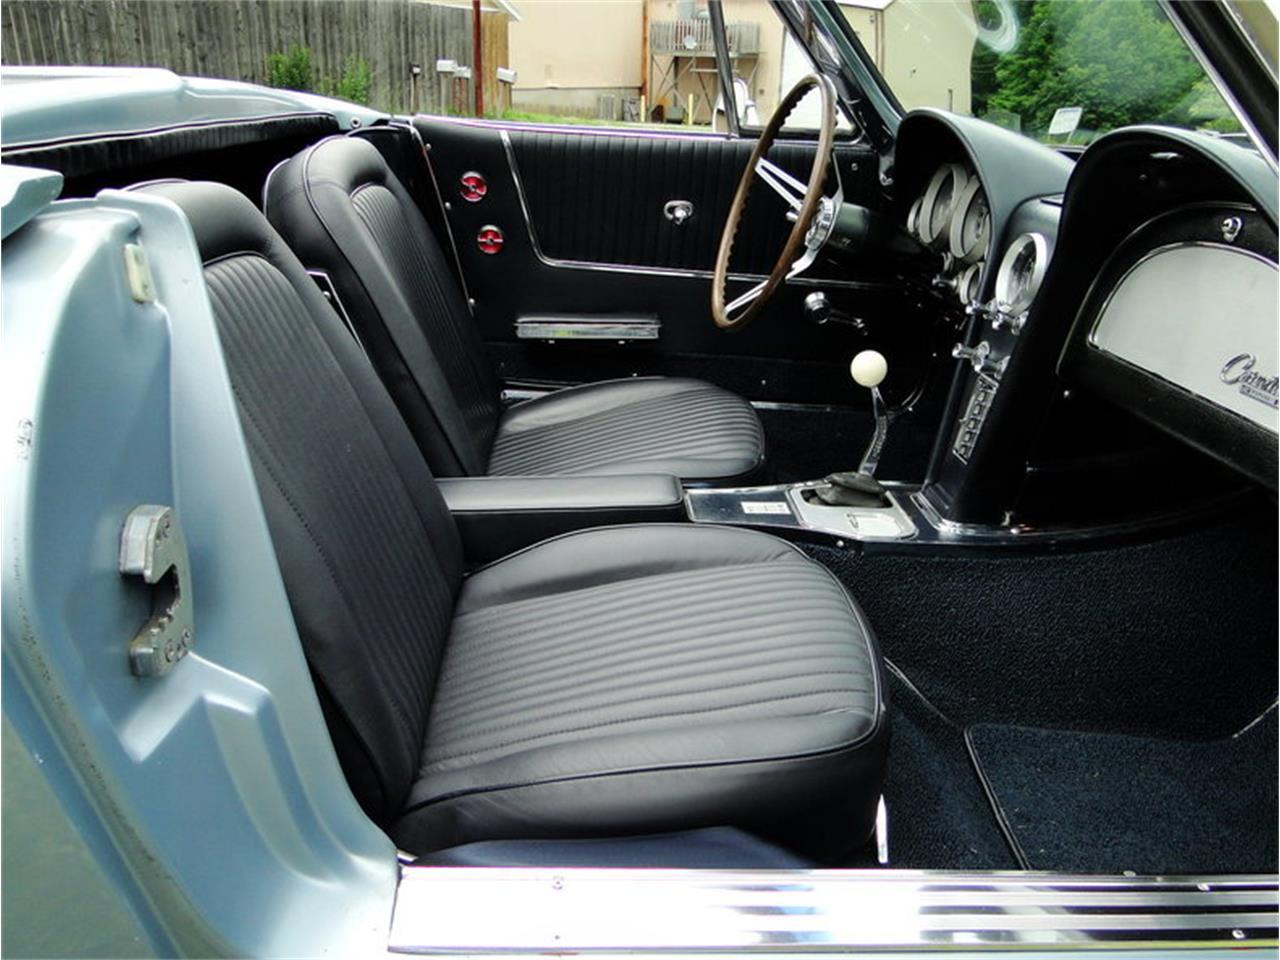 Large Picture of 1964 Corvette - $39,990.00 - LDZM